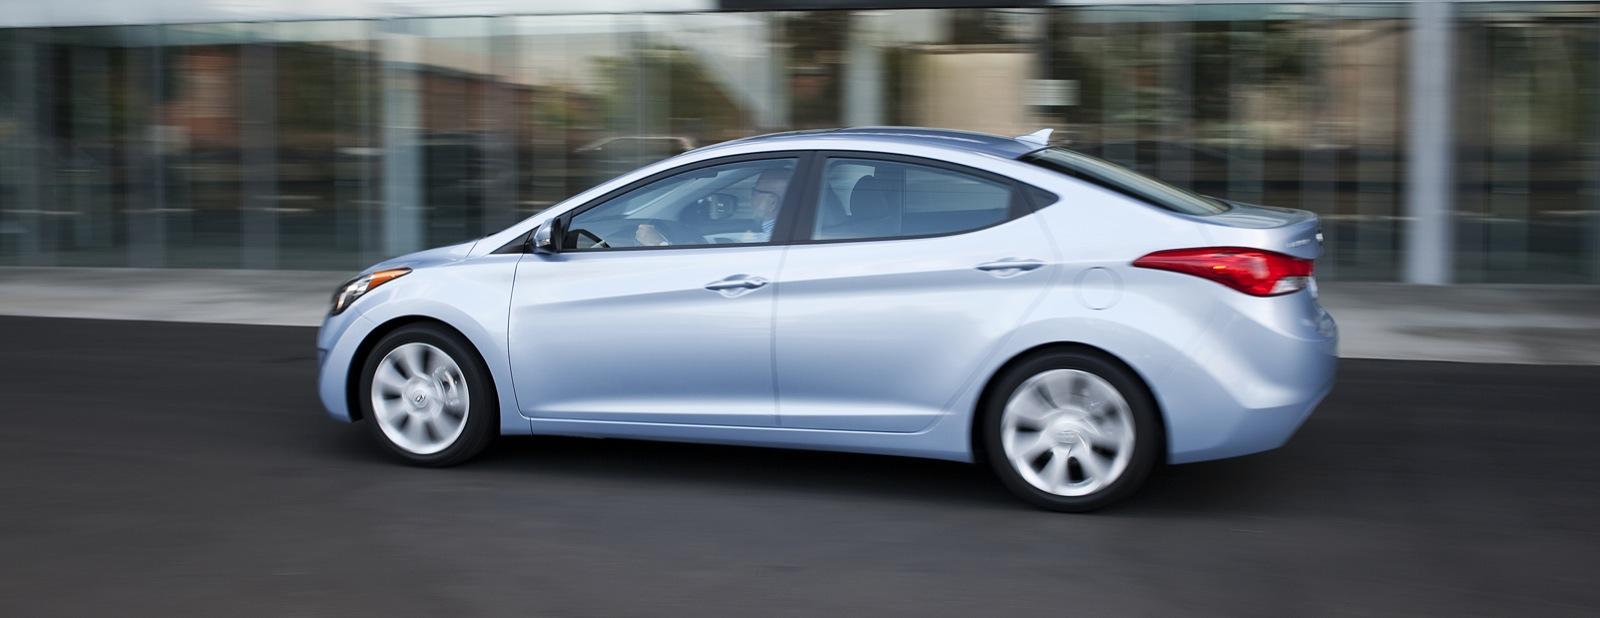 Consumer Watchdog To EPA: Re Test Hyundai Elantra Gas Mileage